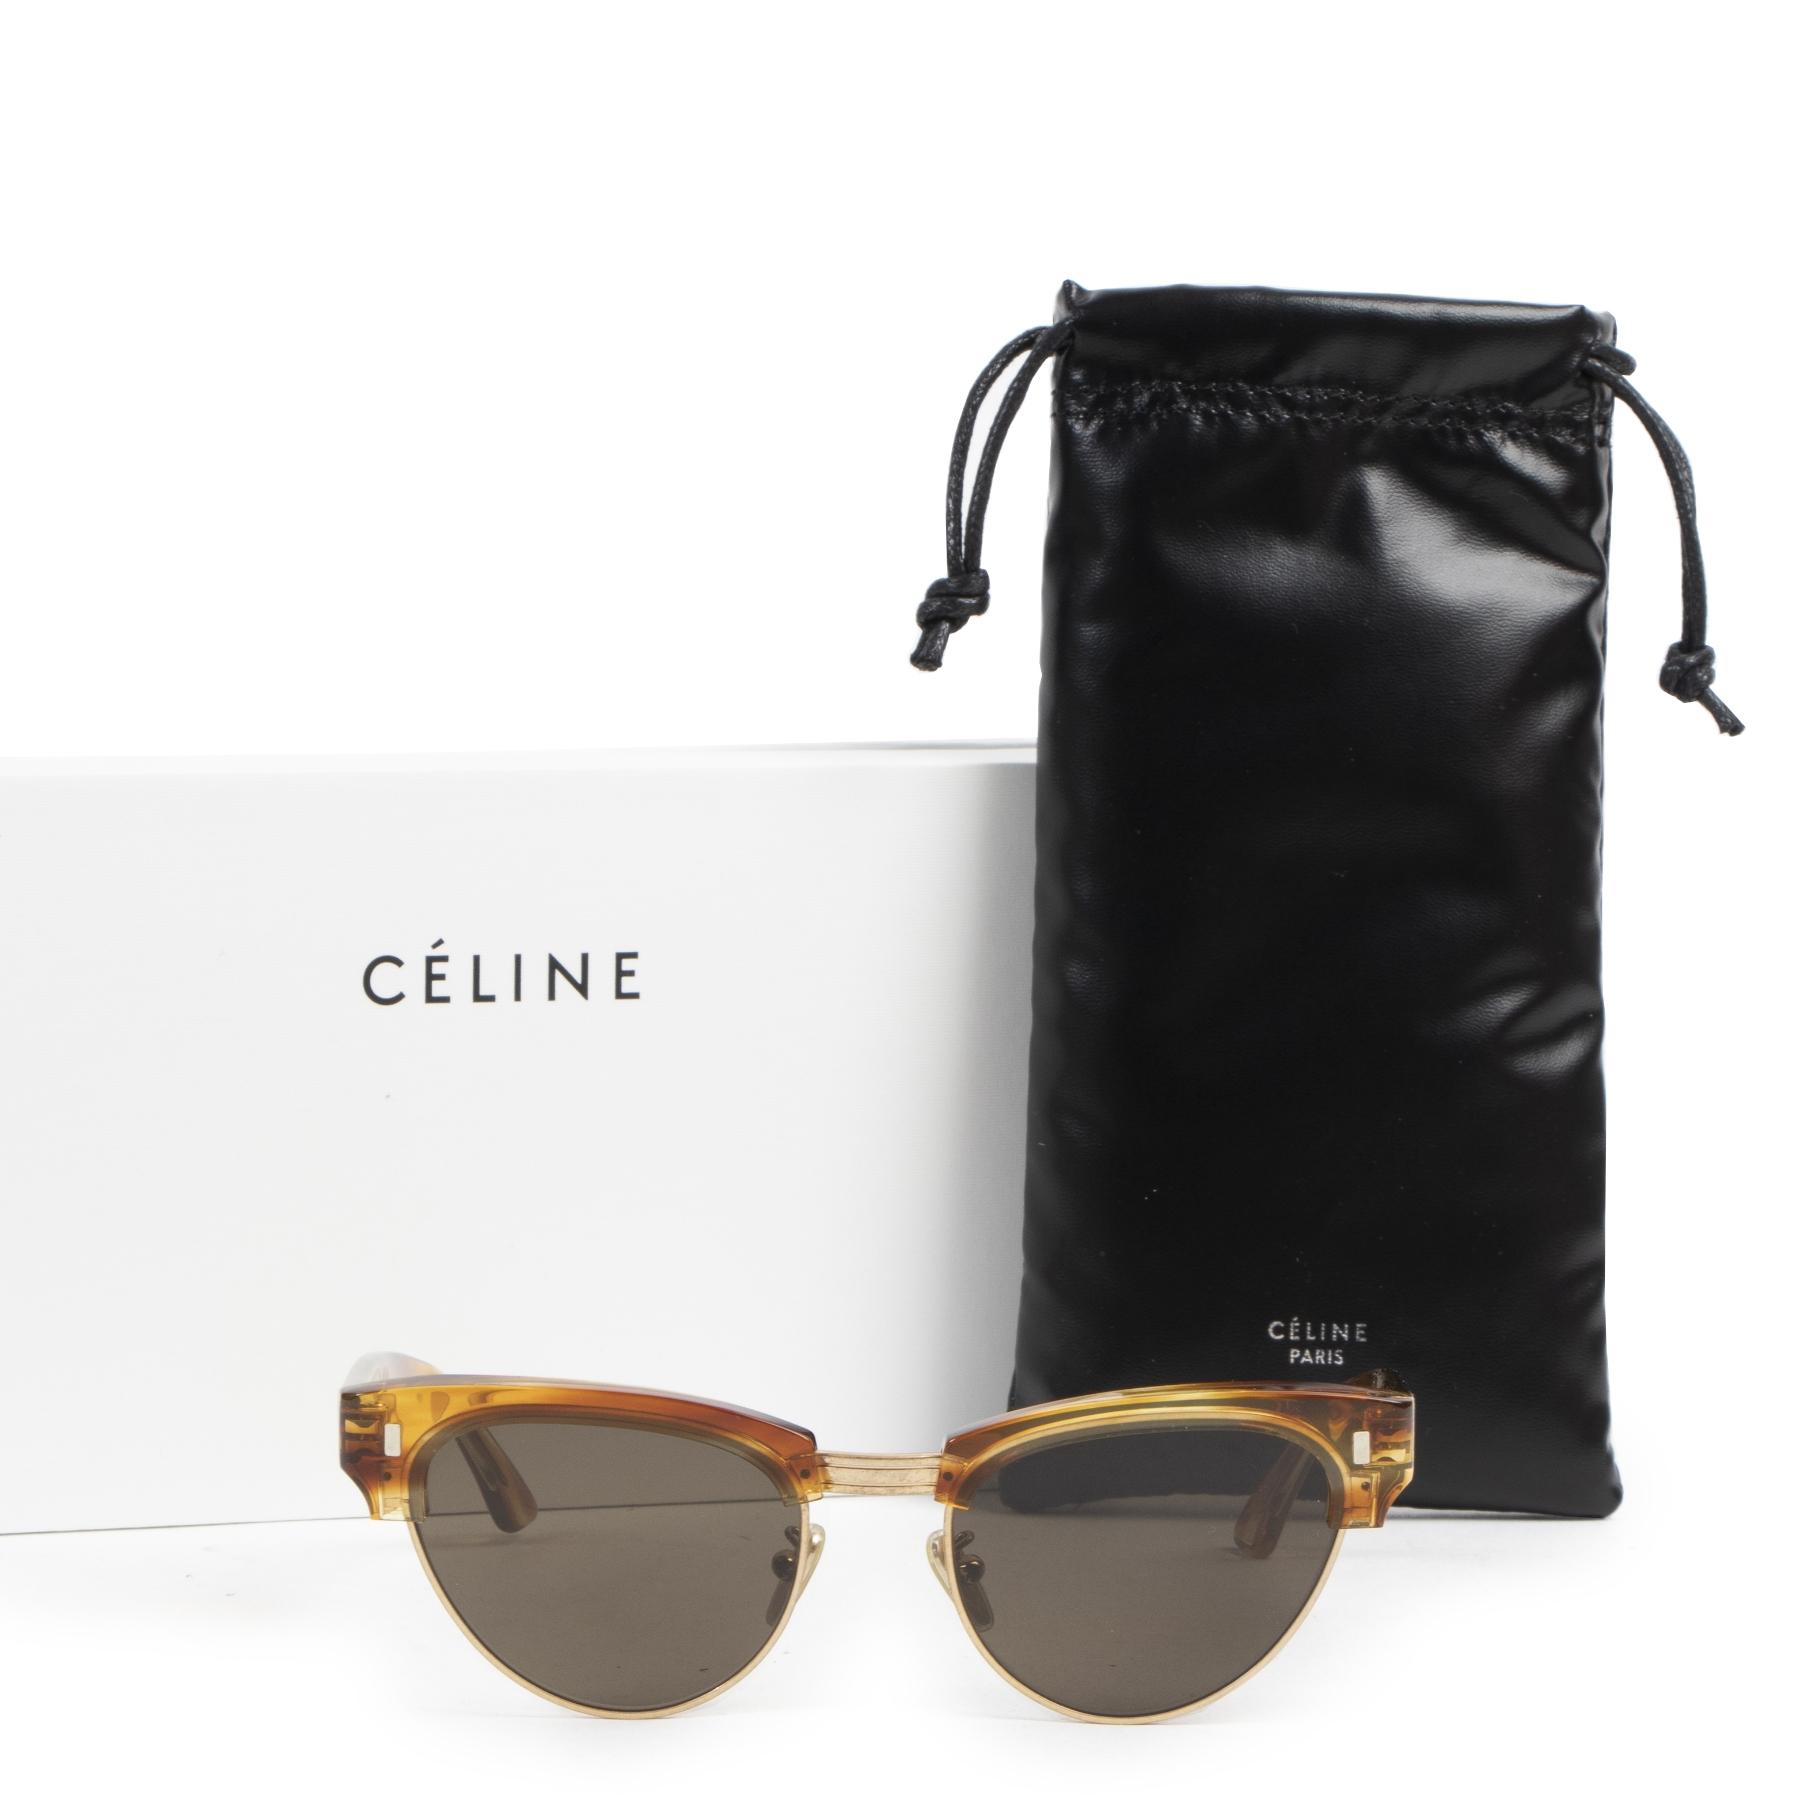 Céline Round 0059 Striped Honey Havana Sunglasses